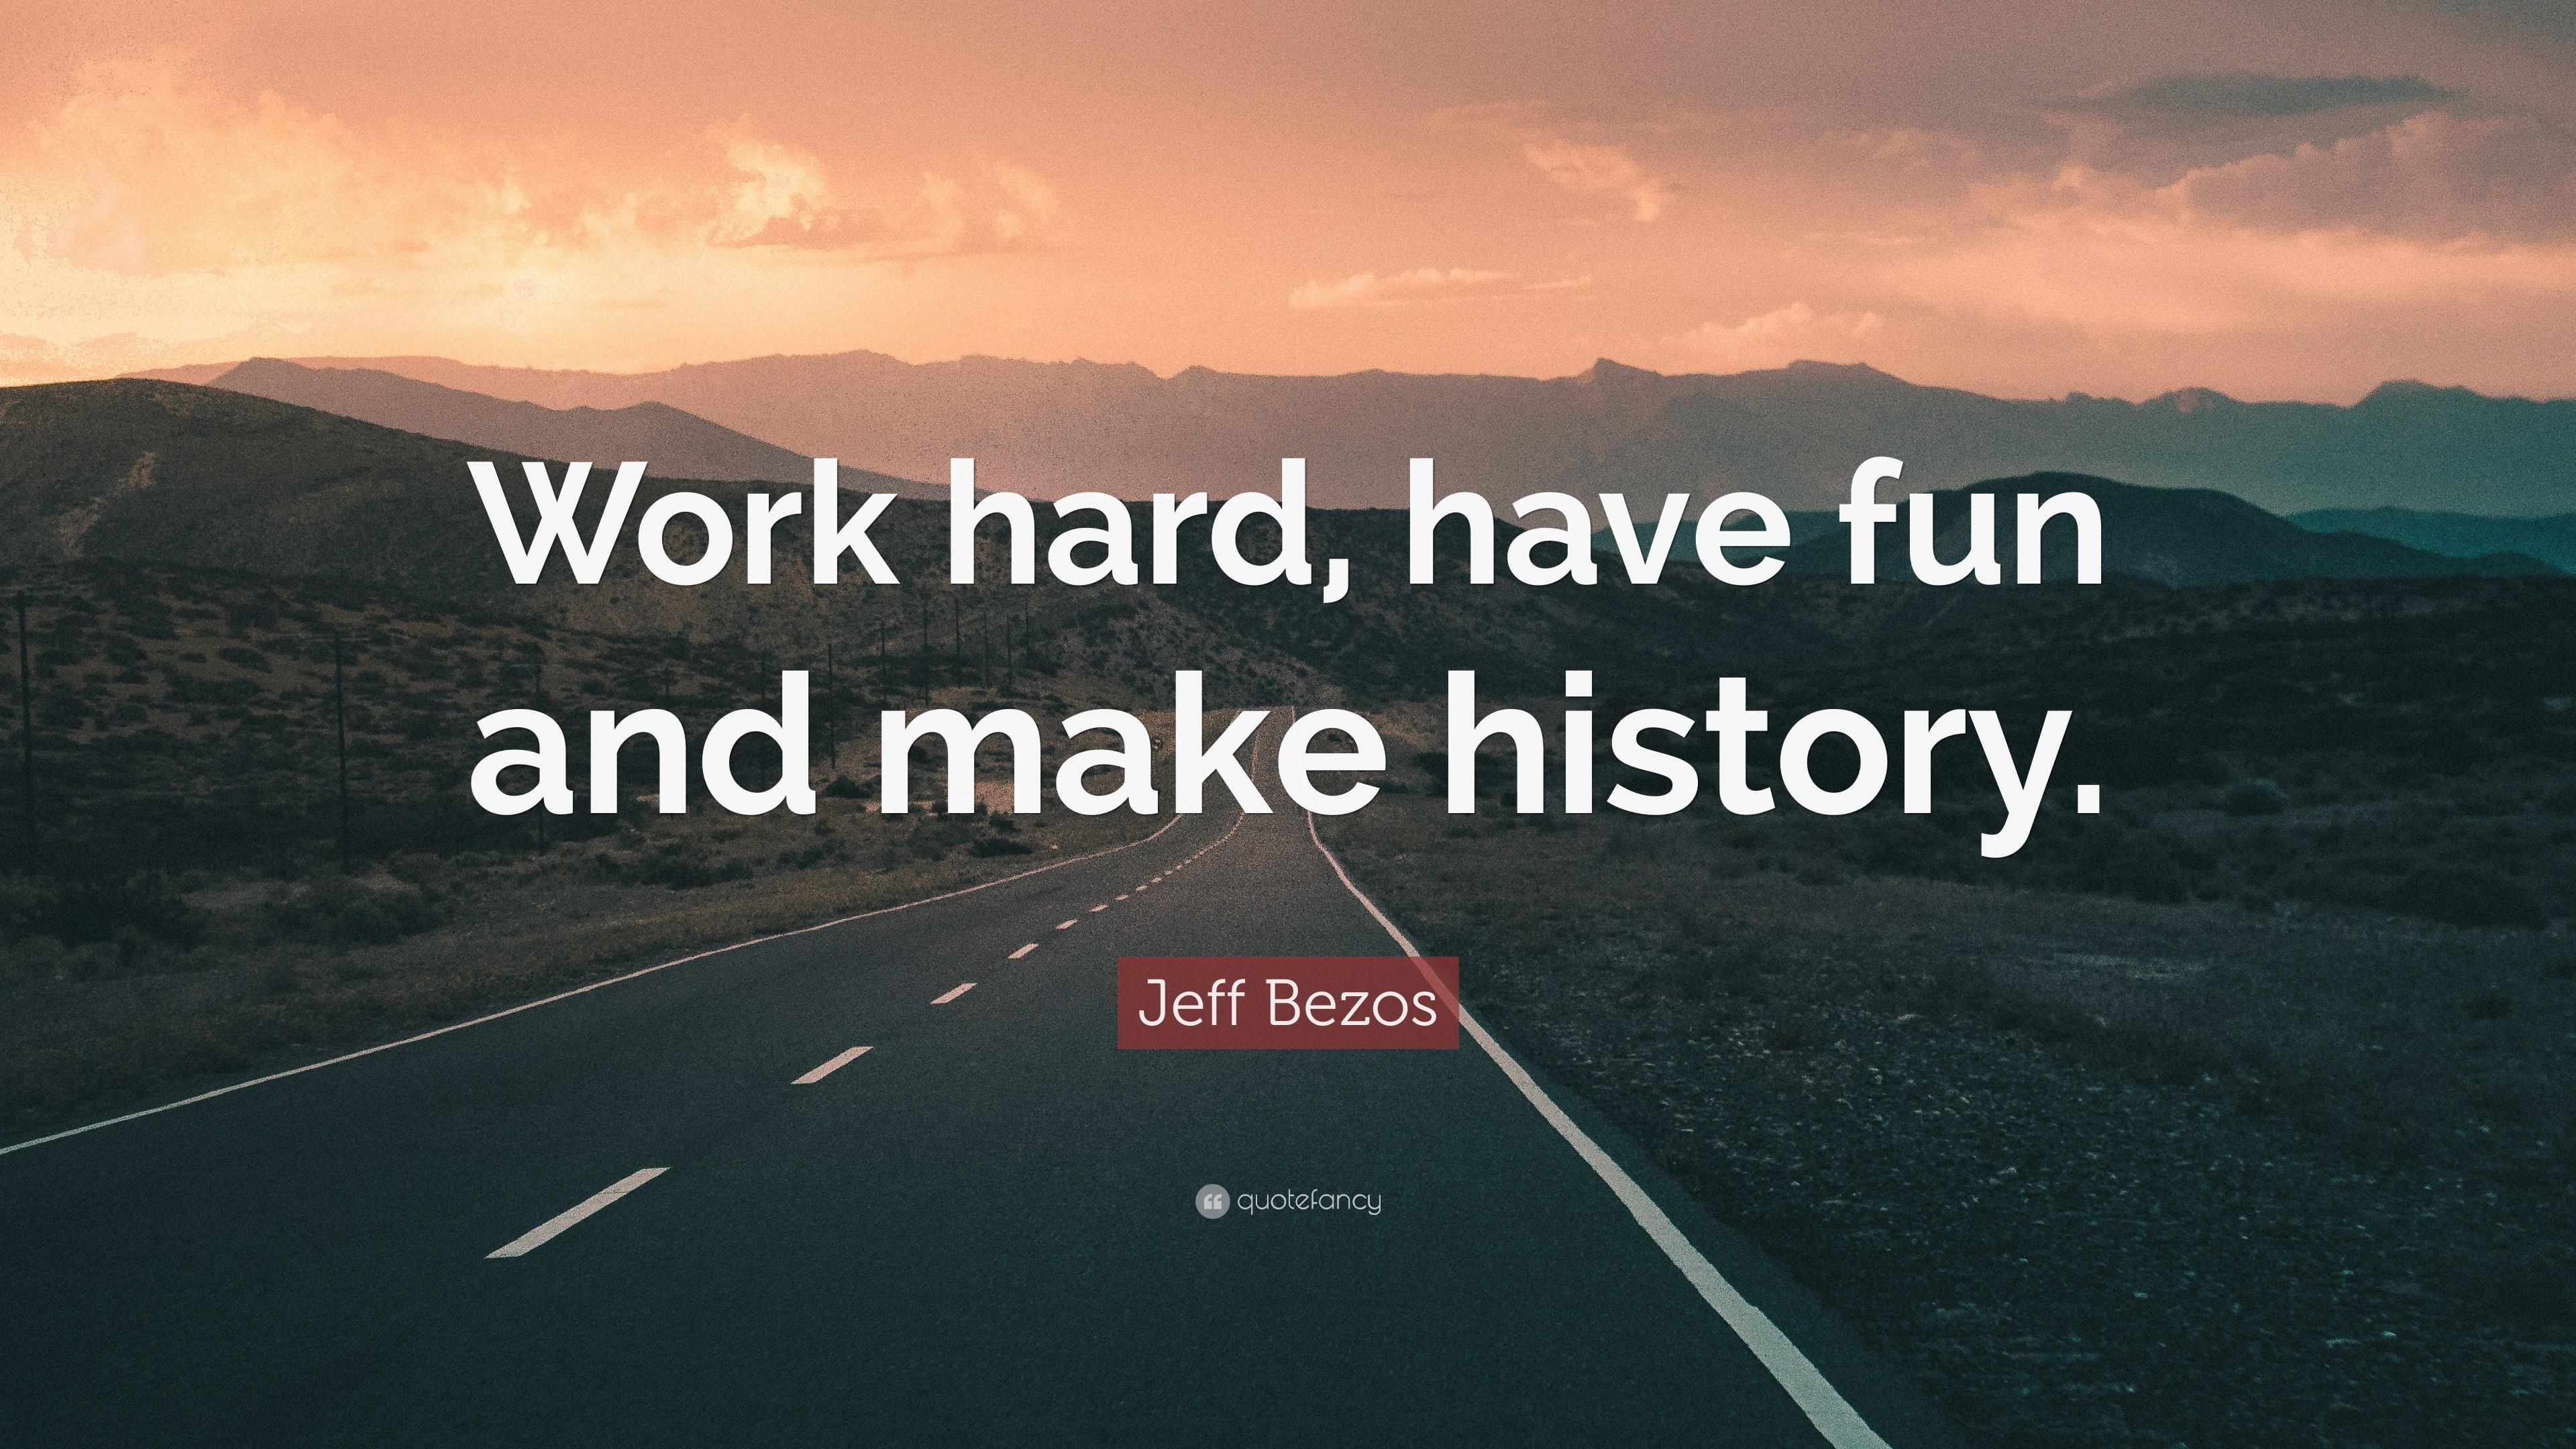 Jeff Bezos Quotes 153 Wallpapers Quotefancy